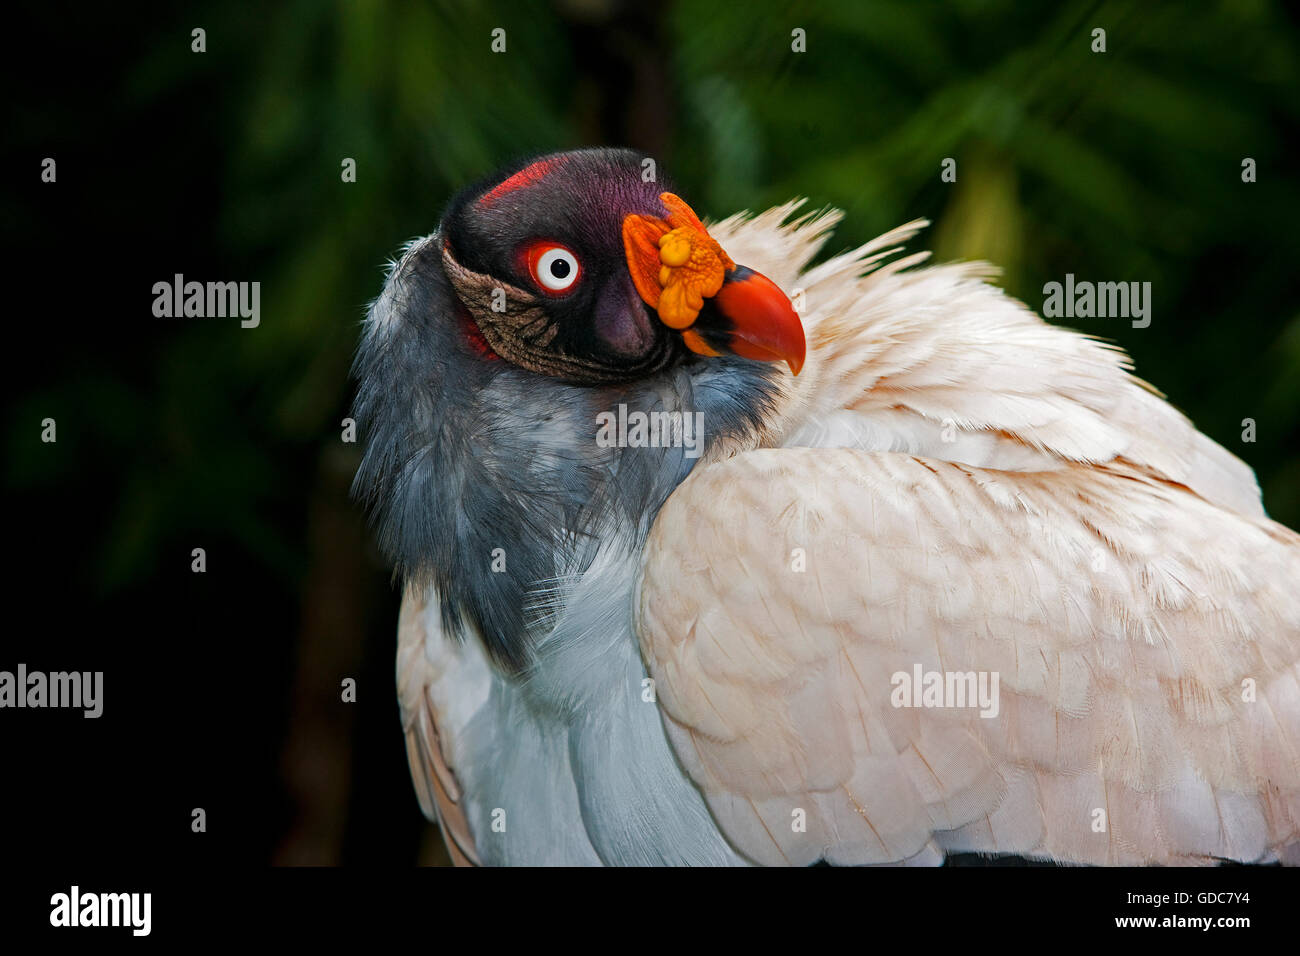 Tête de vautour ROI Sarcoramphus papa Photo Stock